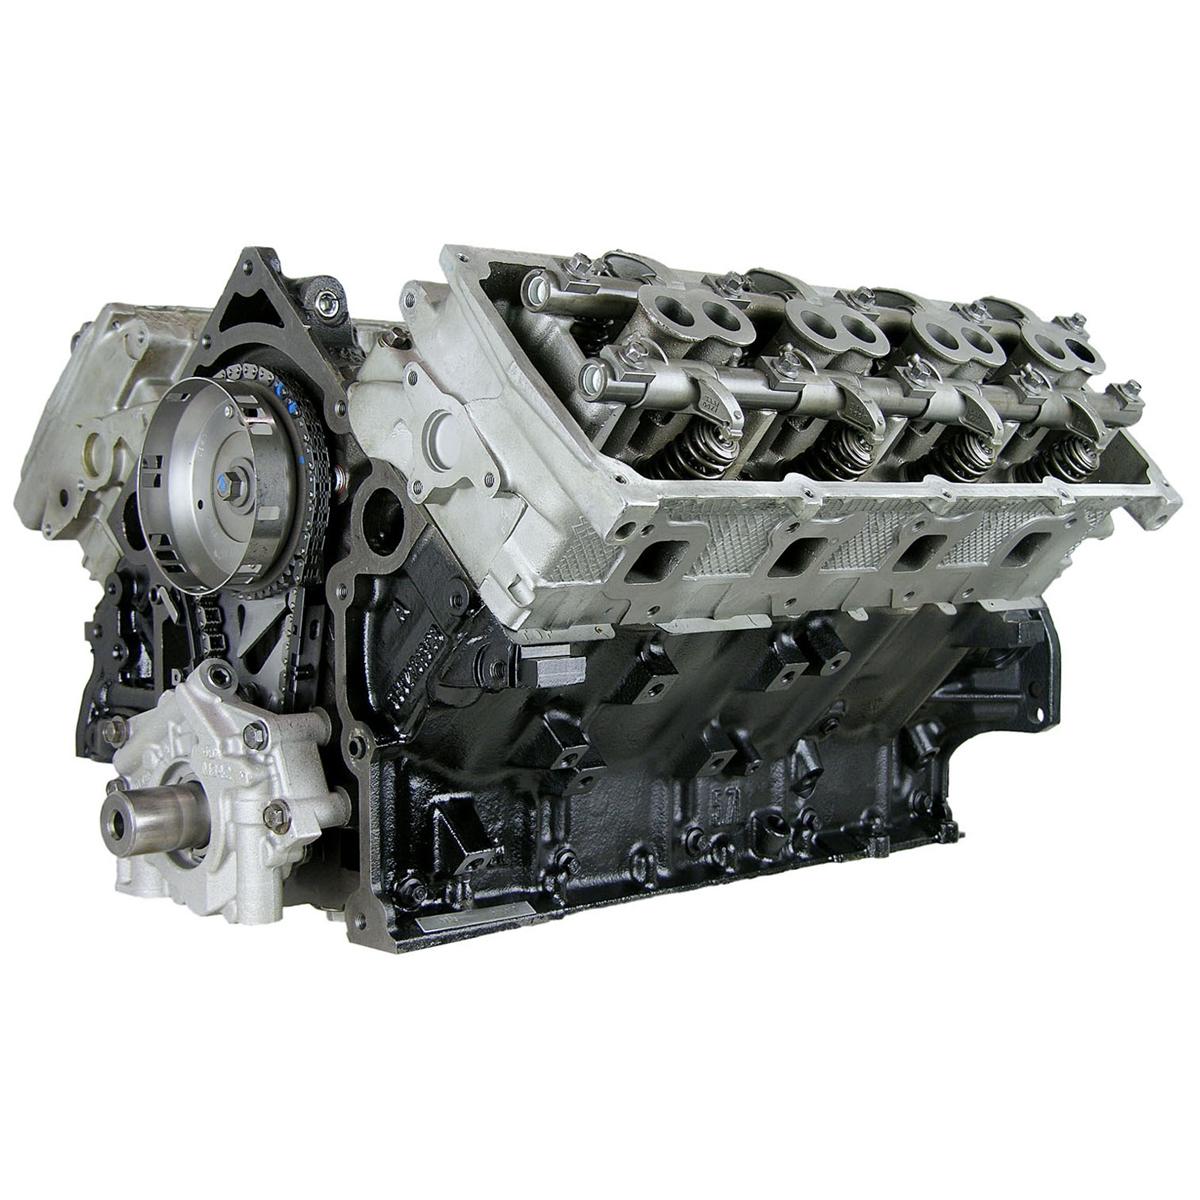 hight resolution of atk hp103 gen iii hemi 5 7l 400hp crate engine mix ram 5 7 hemi engine